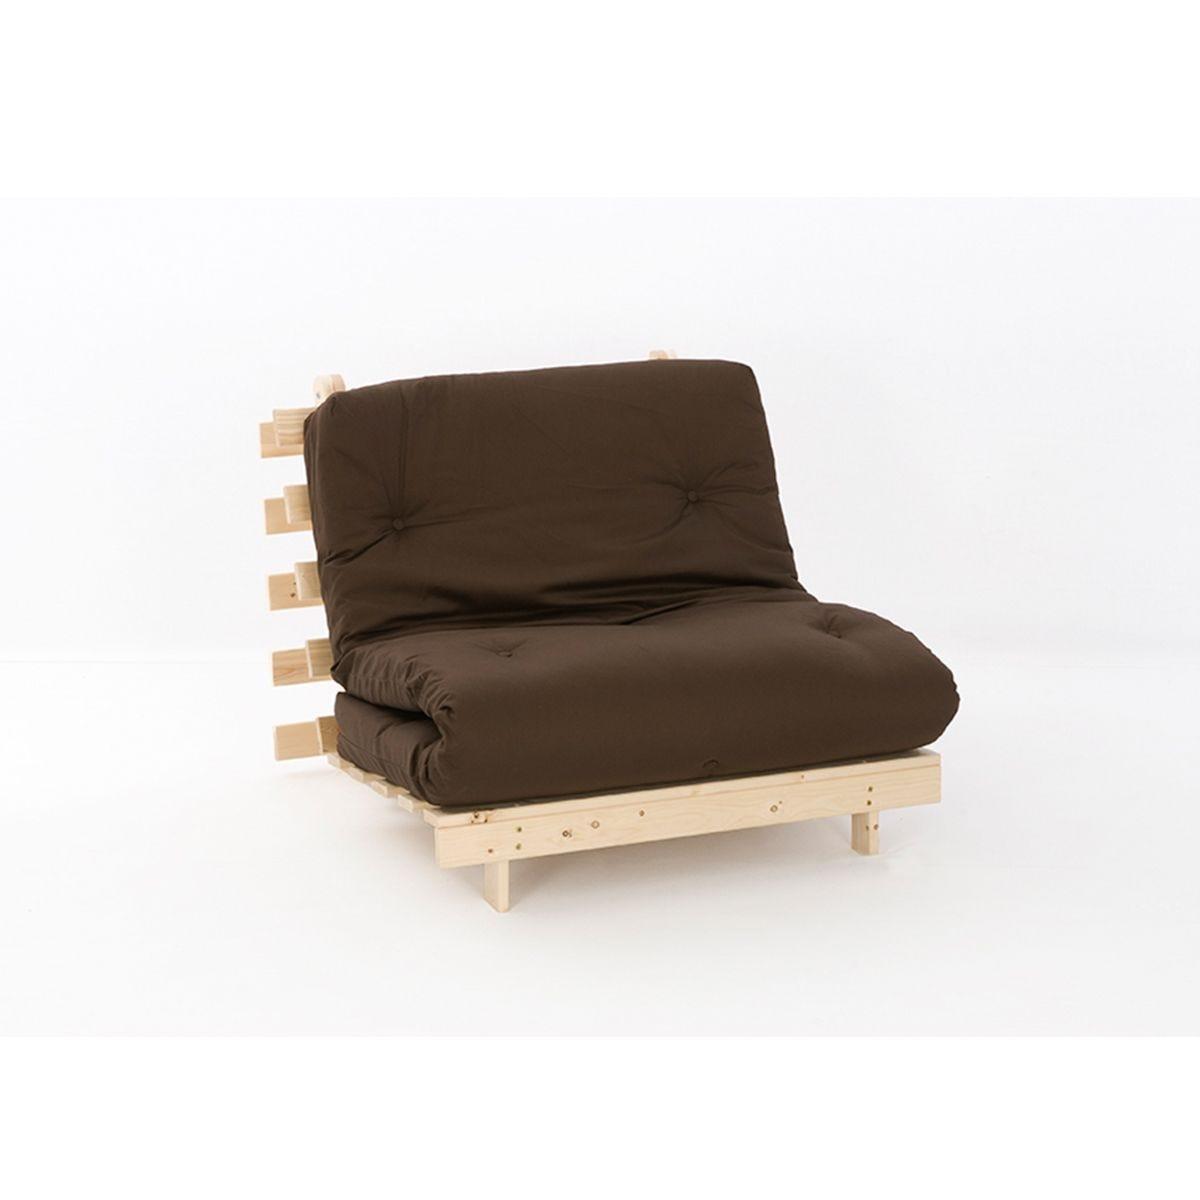 Ayr Futon Set With Tufted Mattress - Chocolate